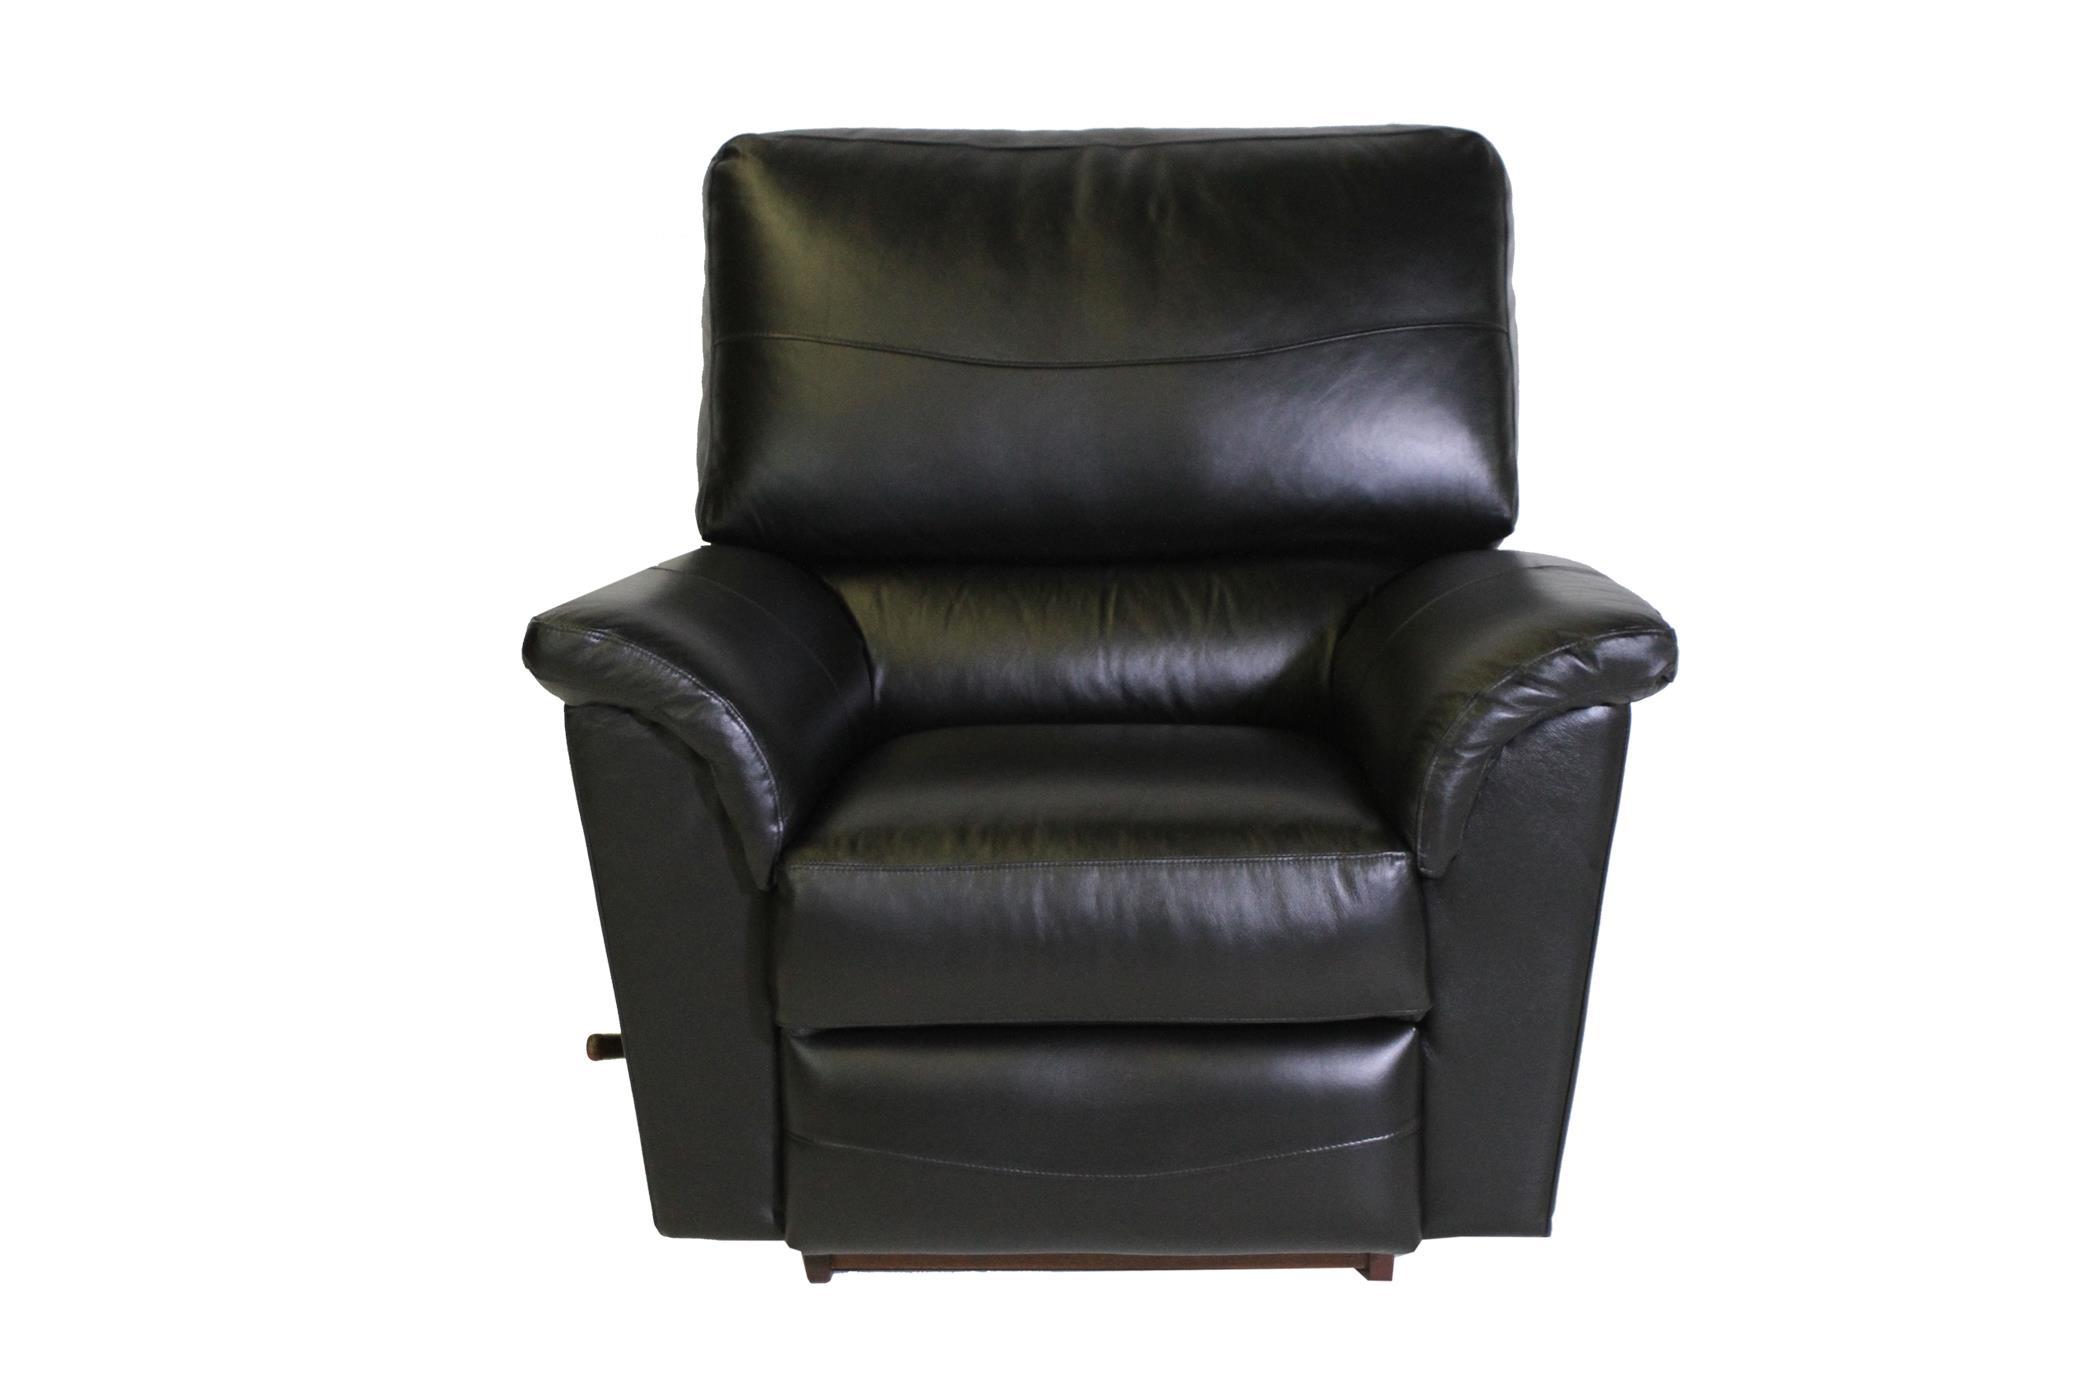 La-Z-Boy Reese Reclina-Rocker® Recliner - Item Number: 010366 LF885350 007